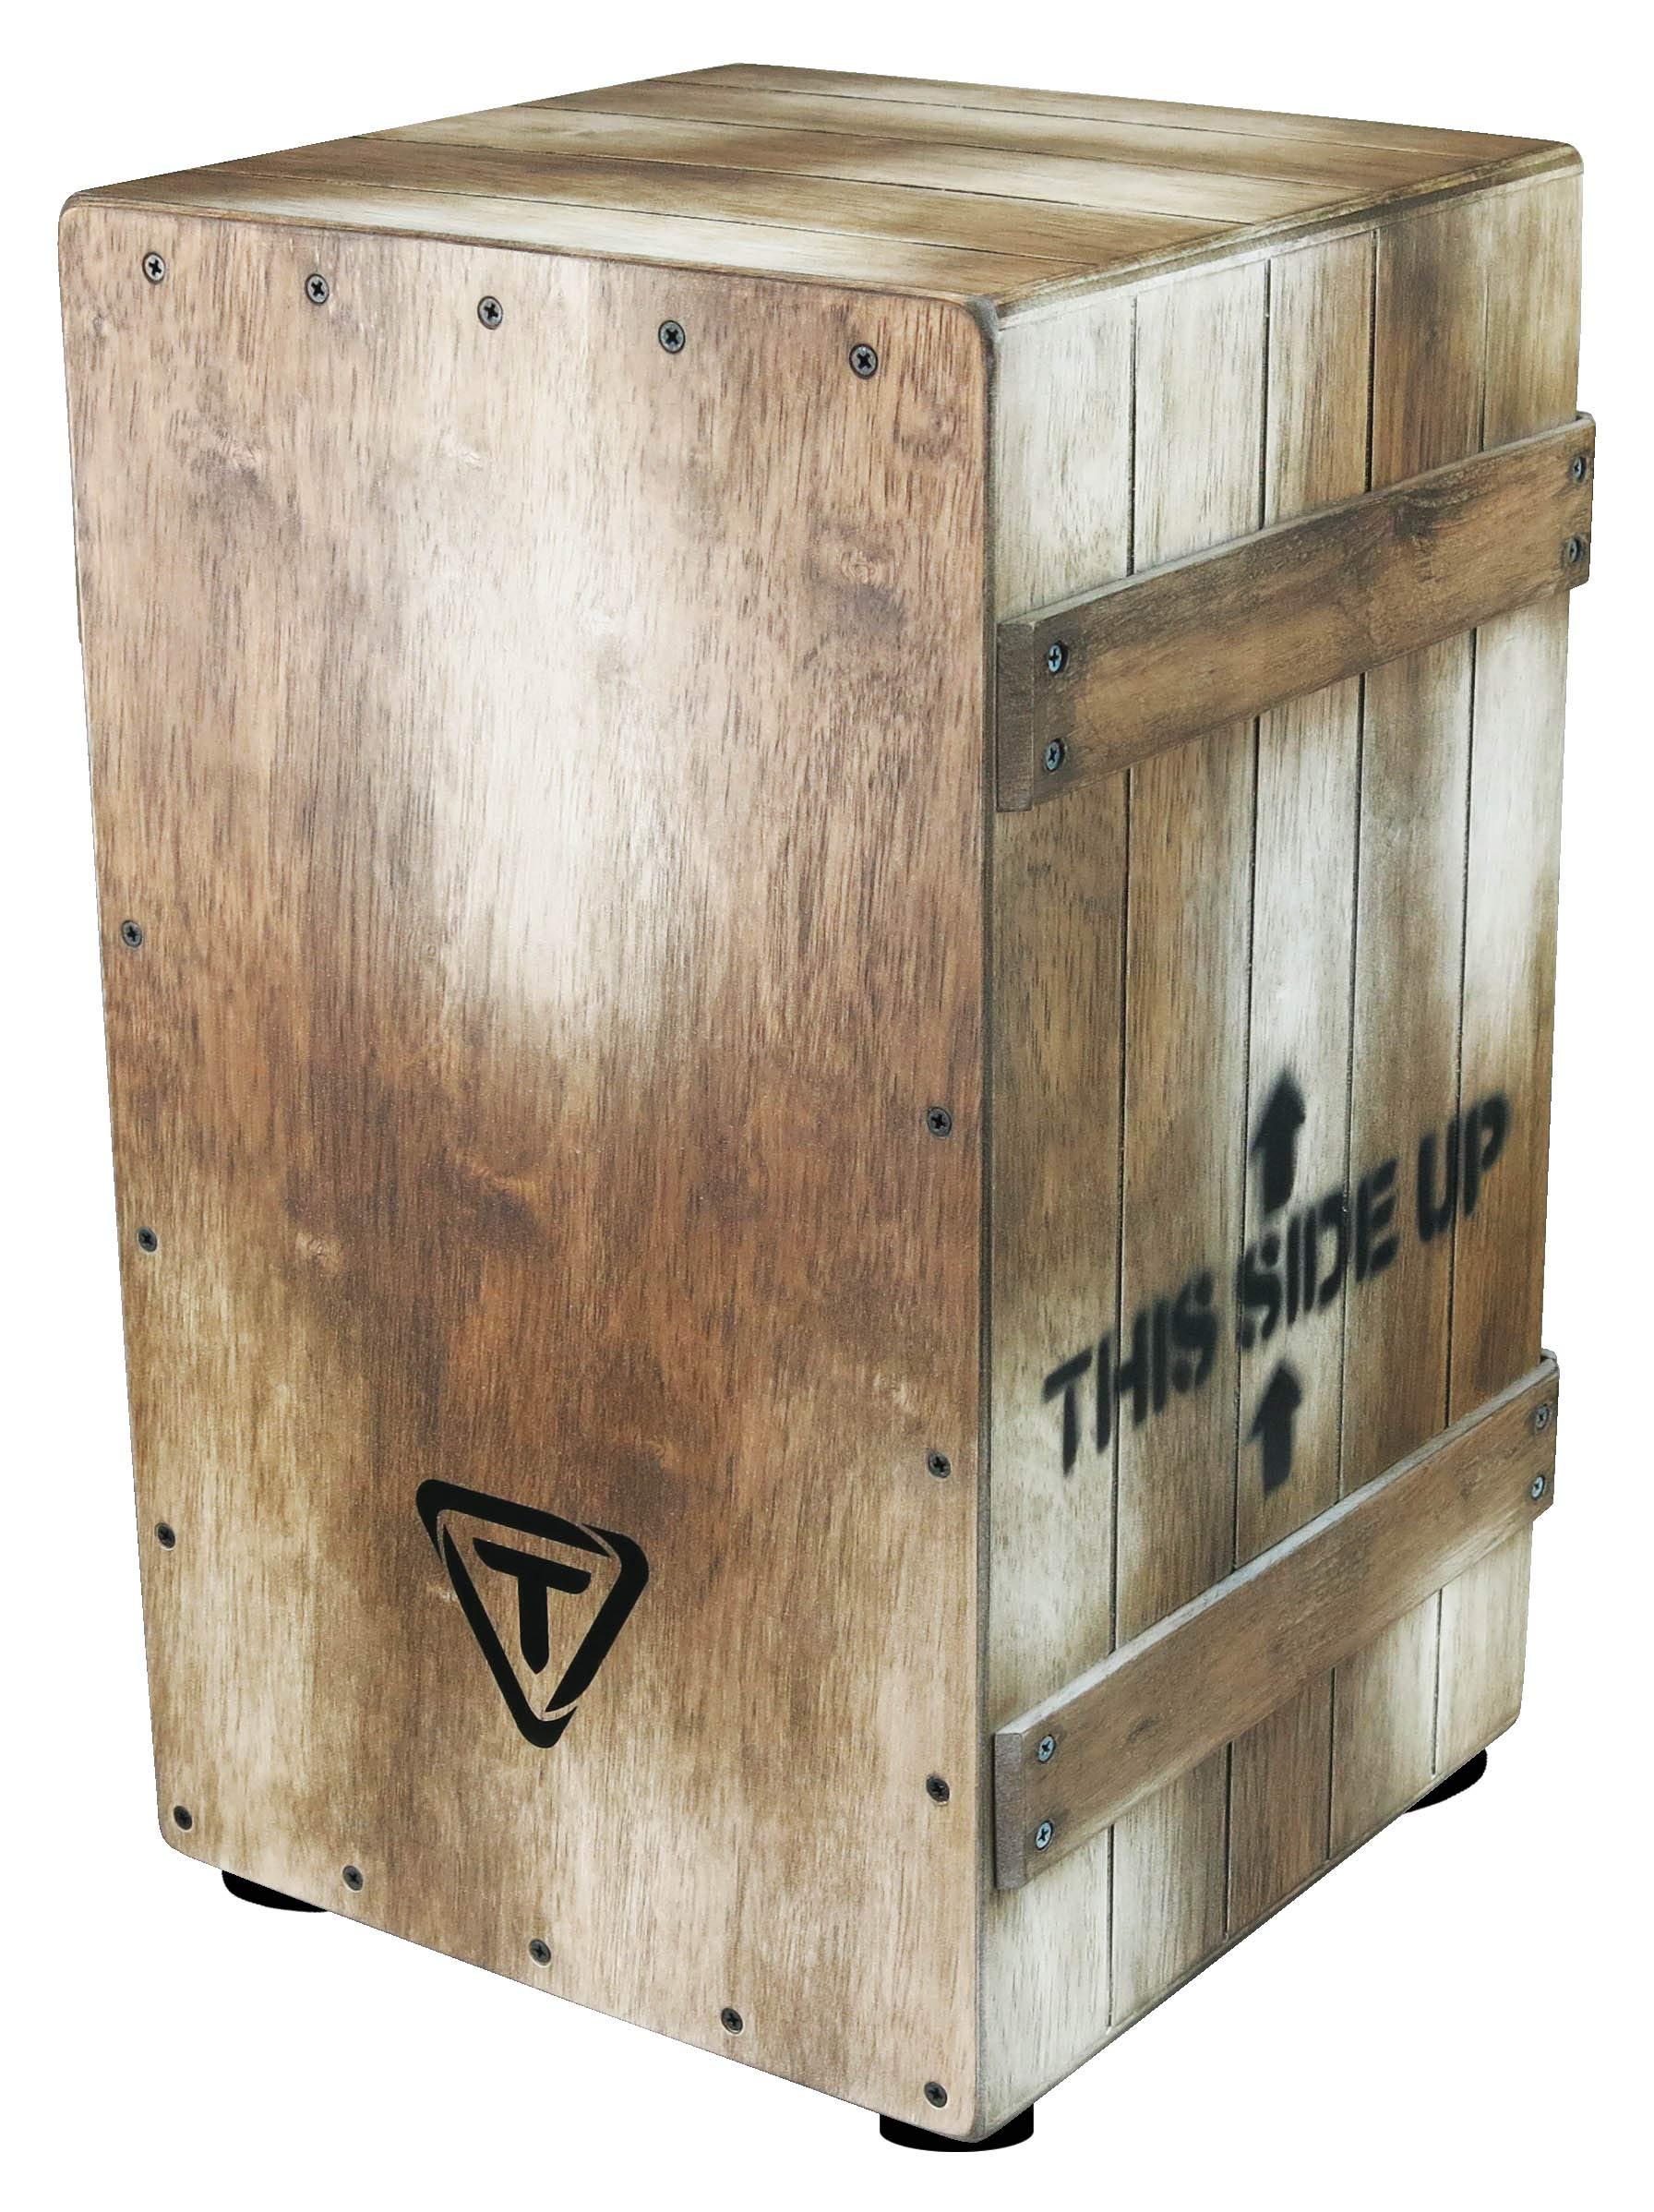 Tycoon Percussion TK2GCT-29 2nd Generation 29 Series Crate Cajon